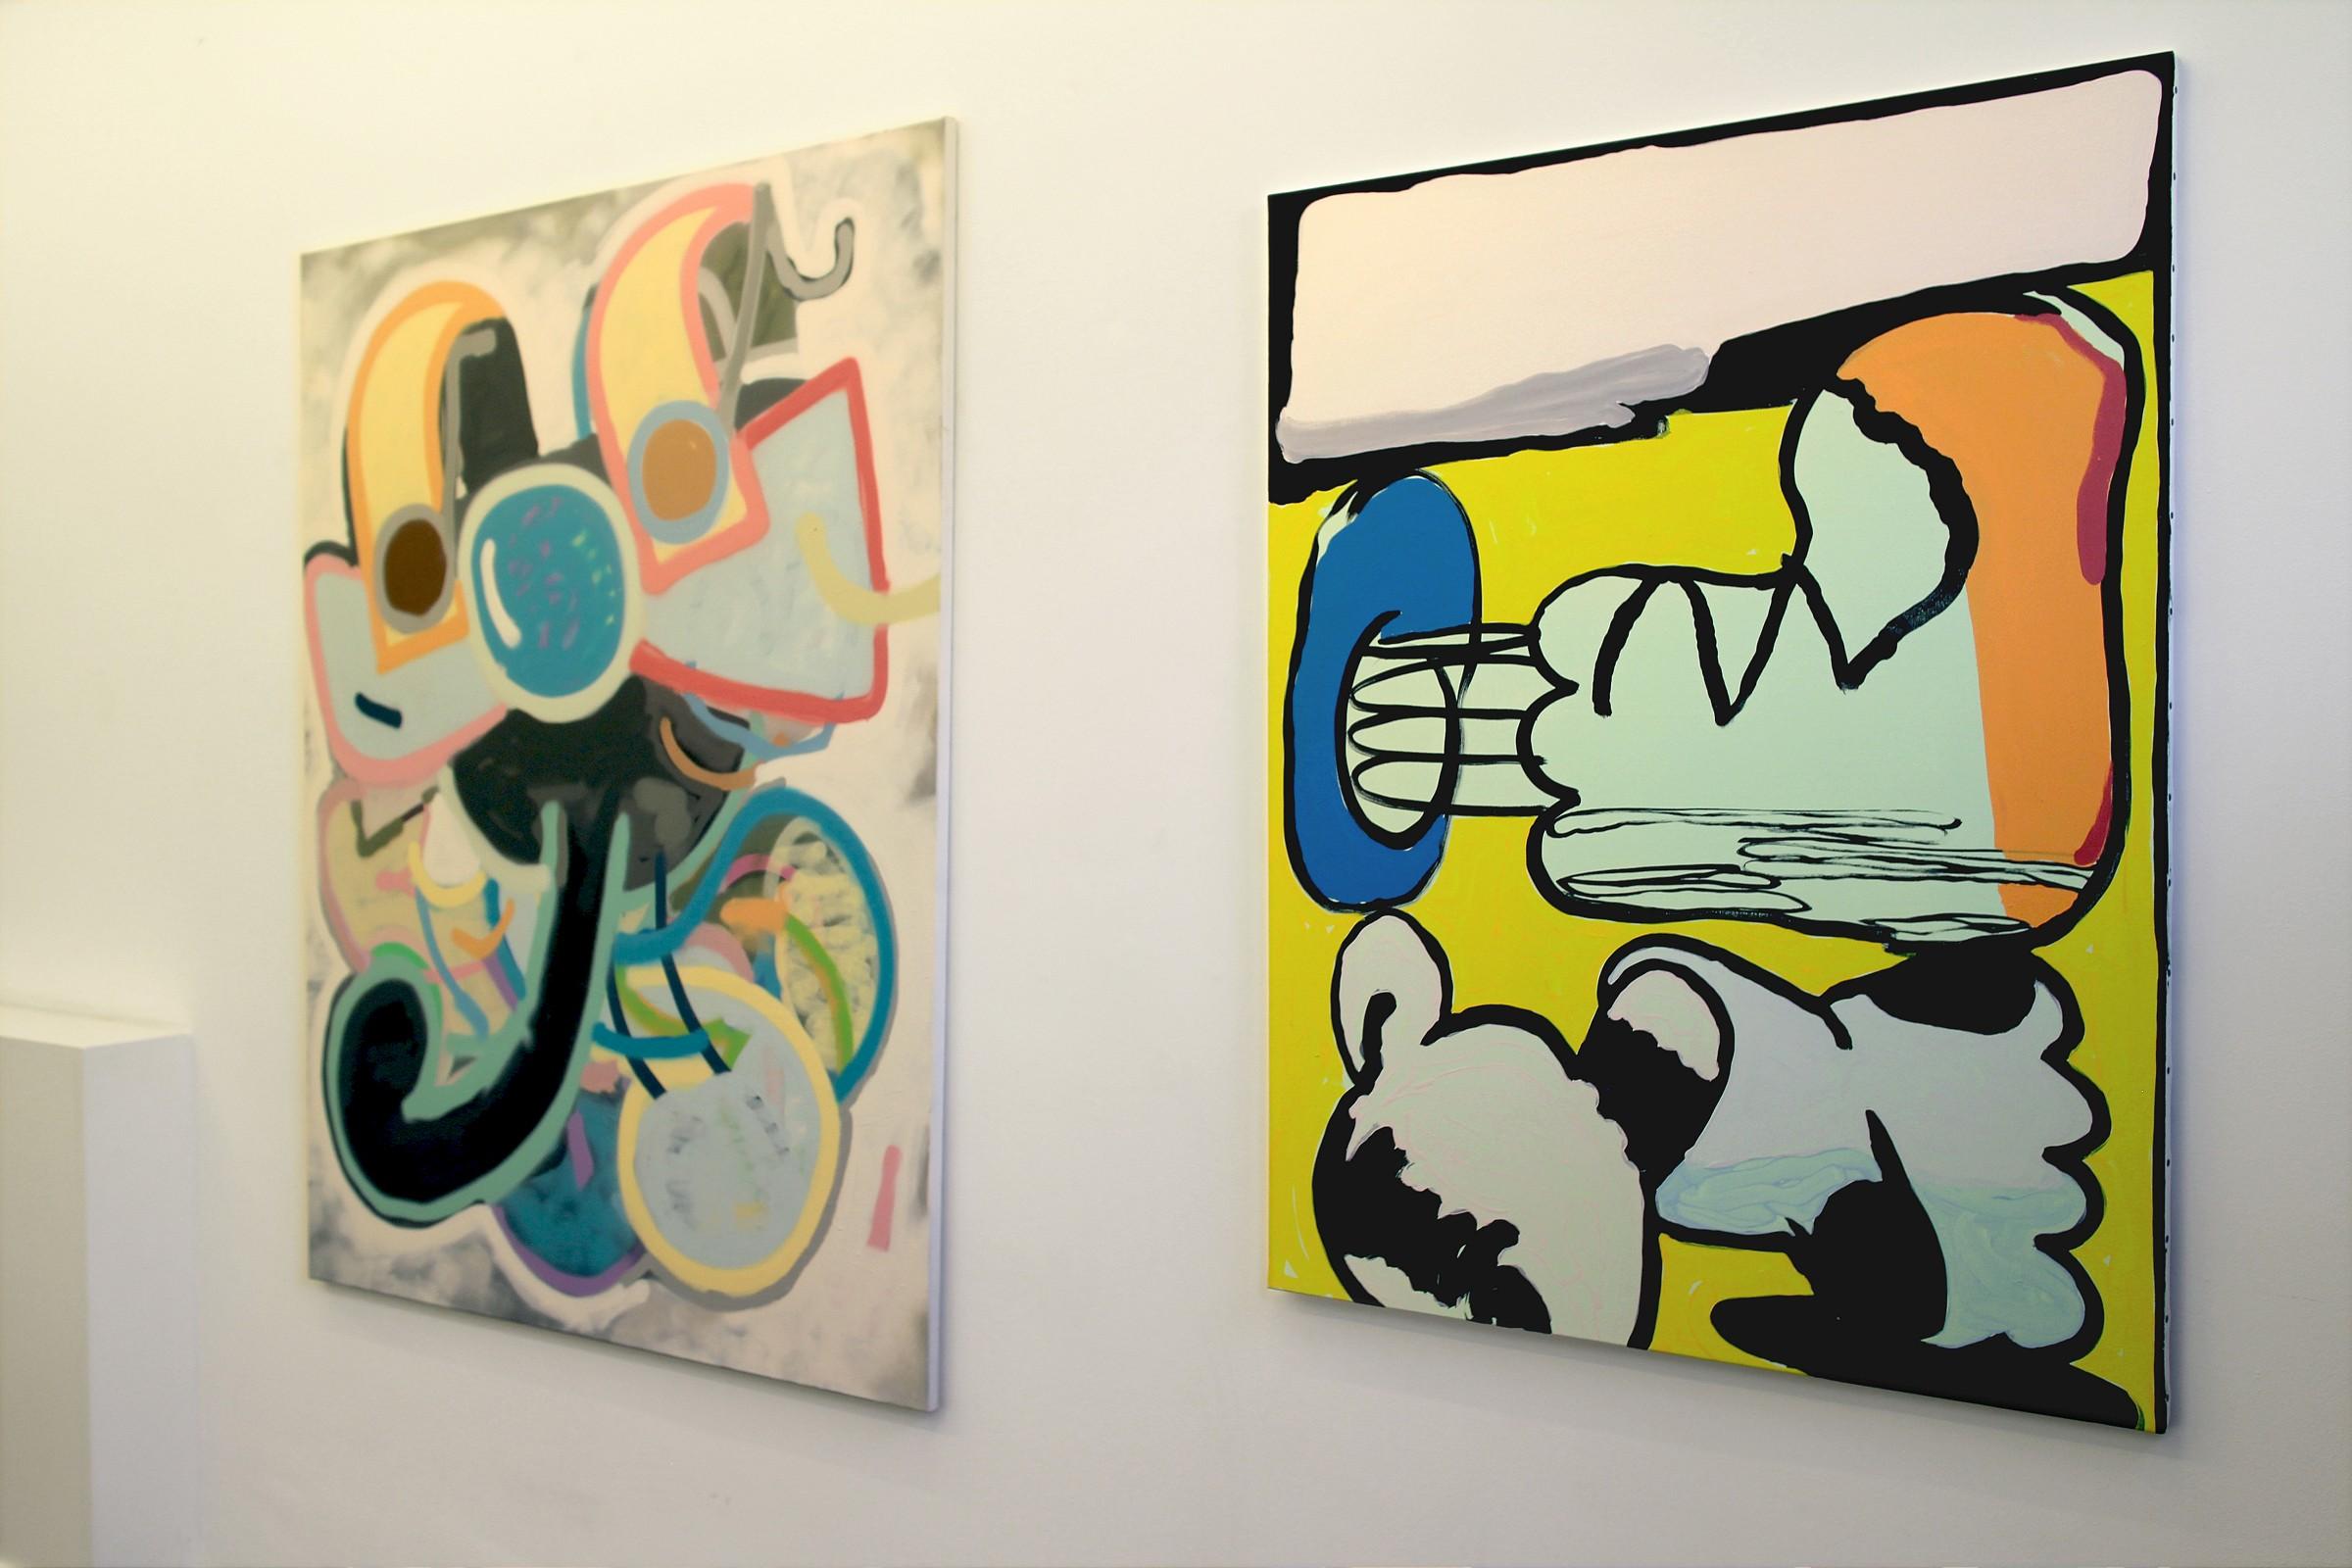 """DontGiveADamns"" na galeria Marian Cramer Projects Artes & contextos dontgiveadamns36"